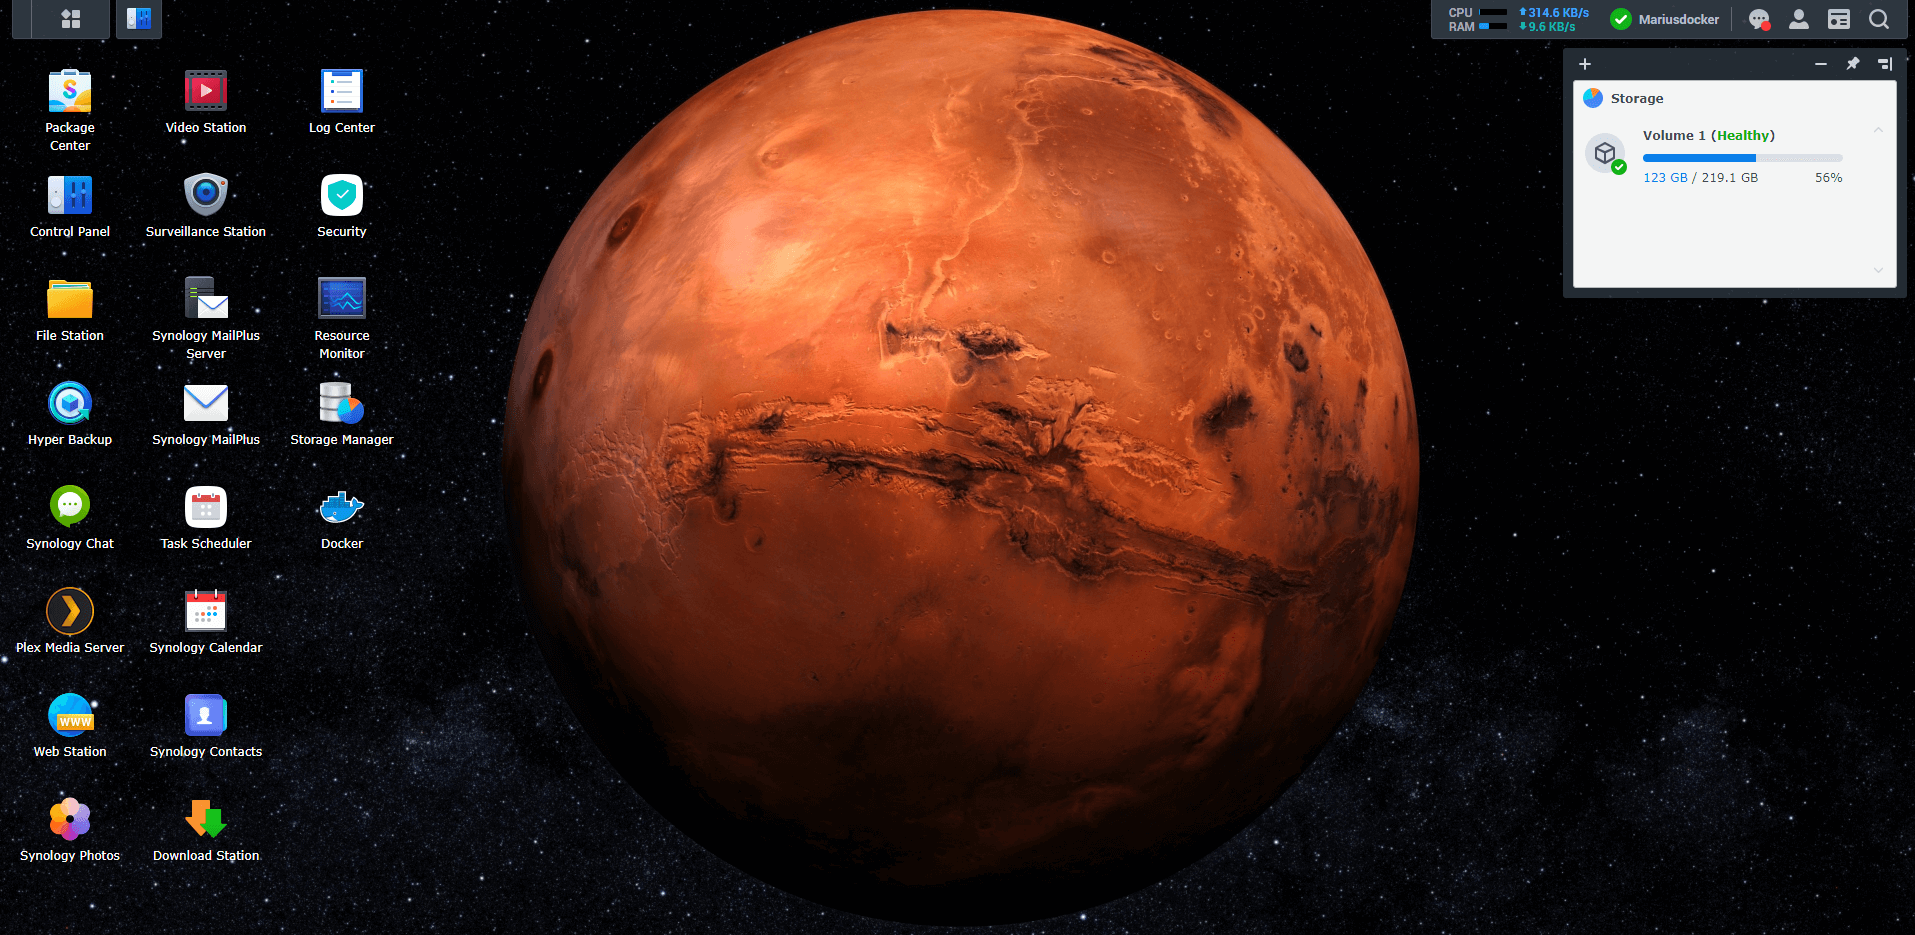 Synology NAS Mars Wallpaper 1